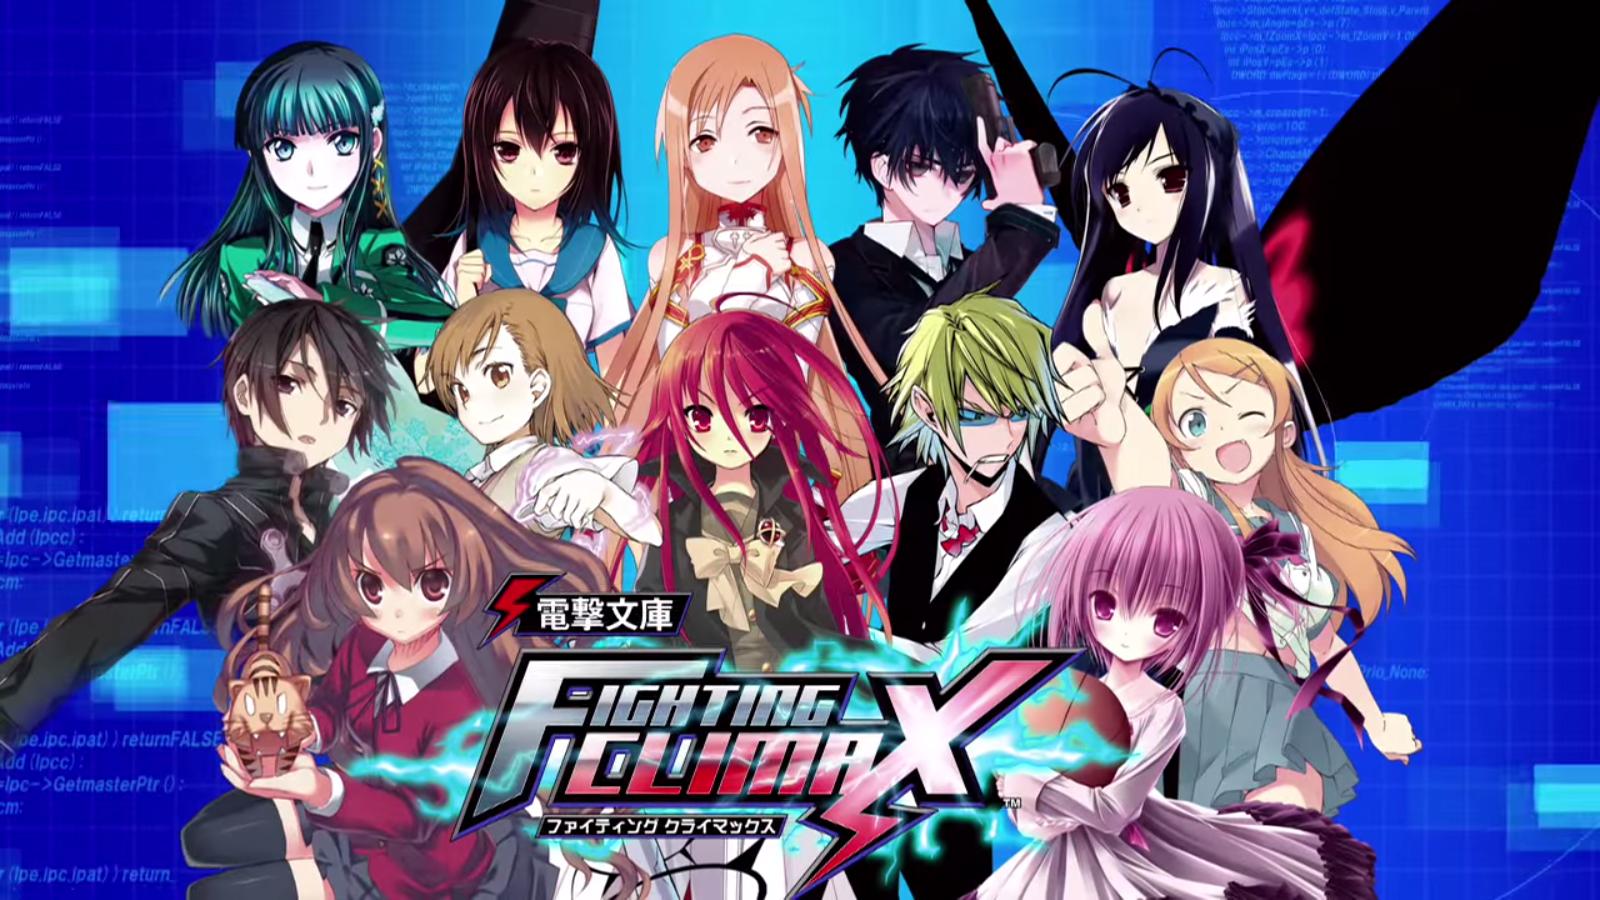 [Análise] Dengeki Bunko Fighting Climax Arcade,PS3 & PSVita Fightmax